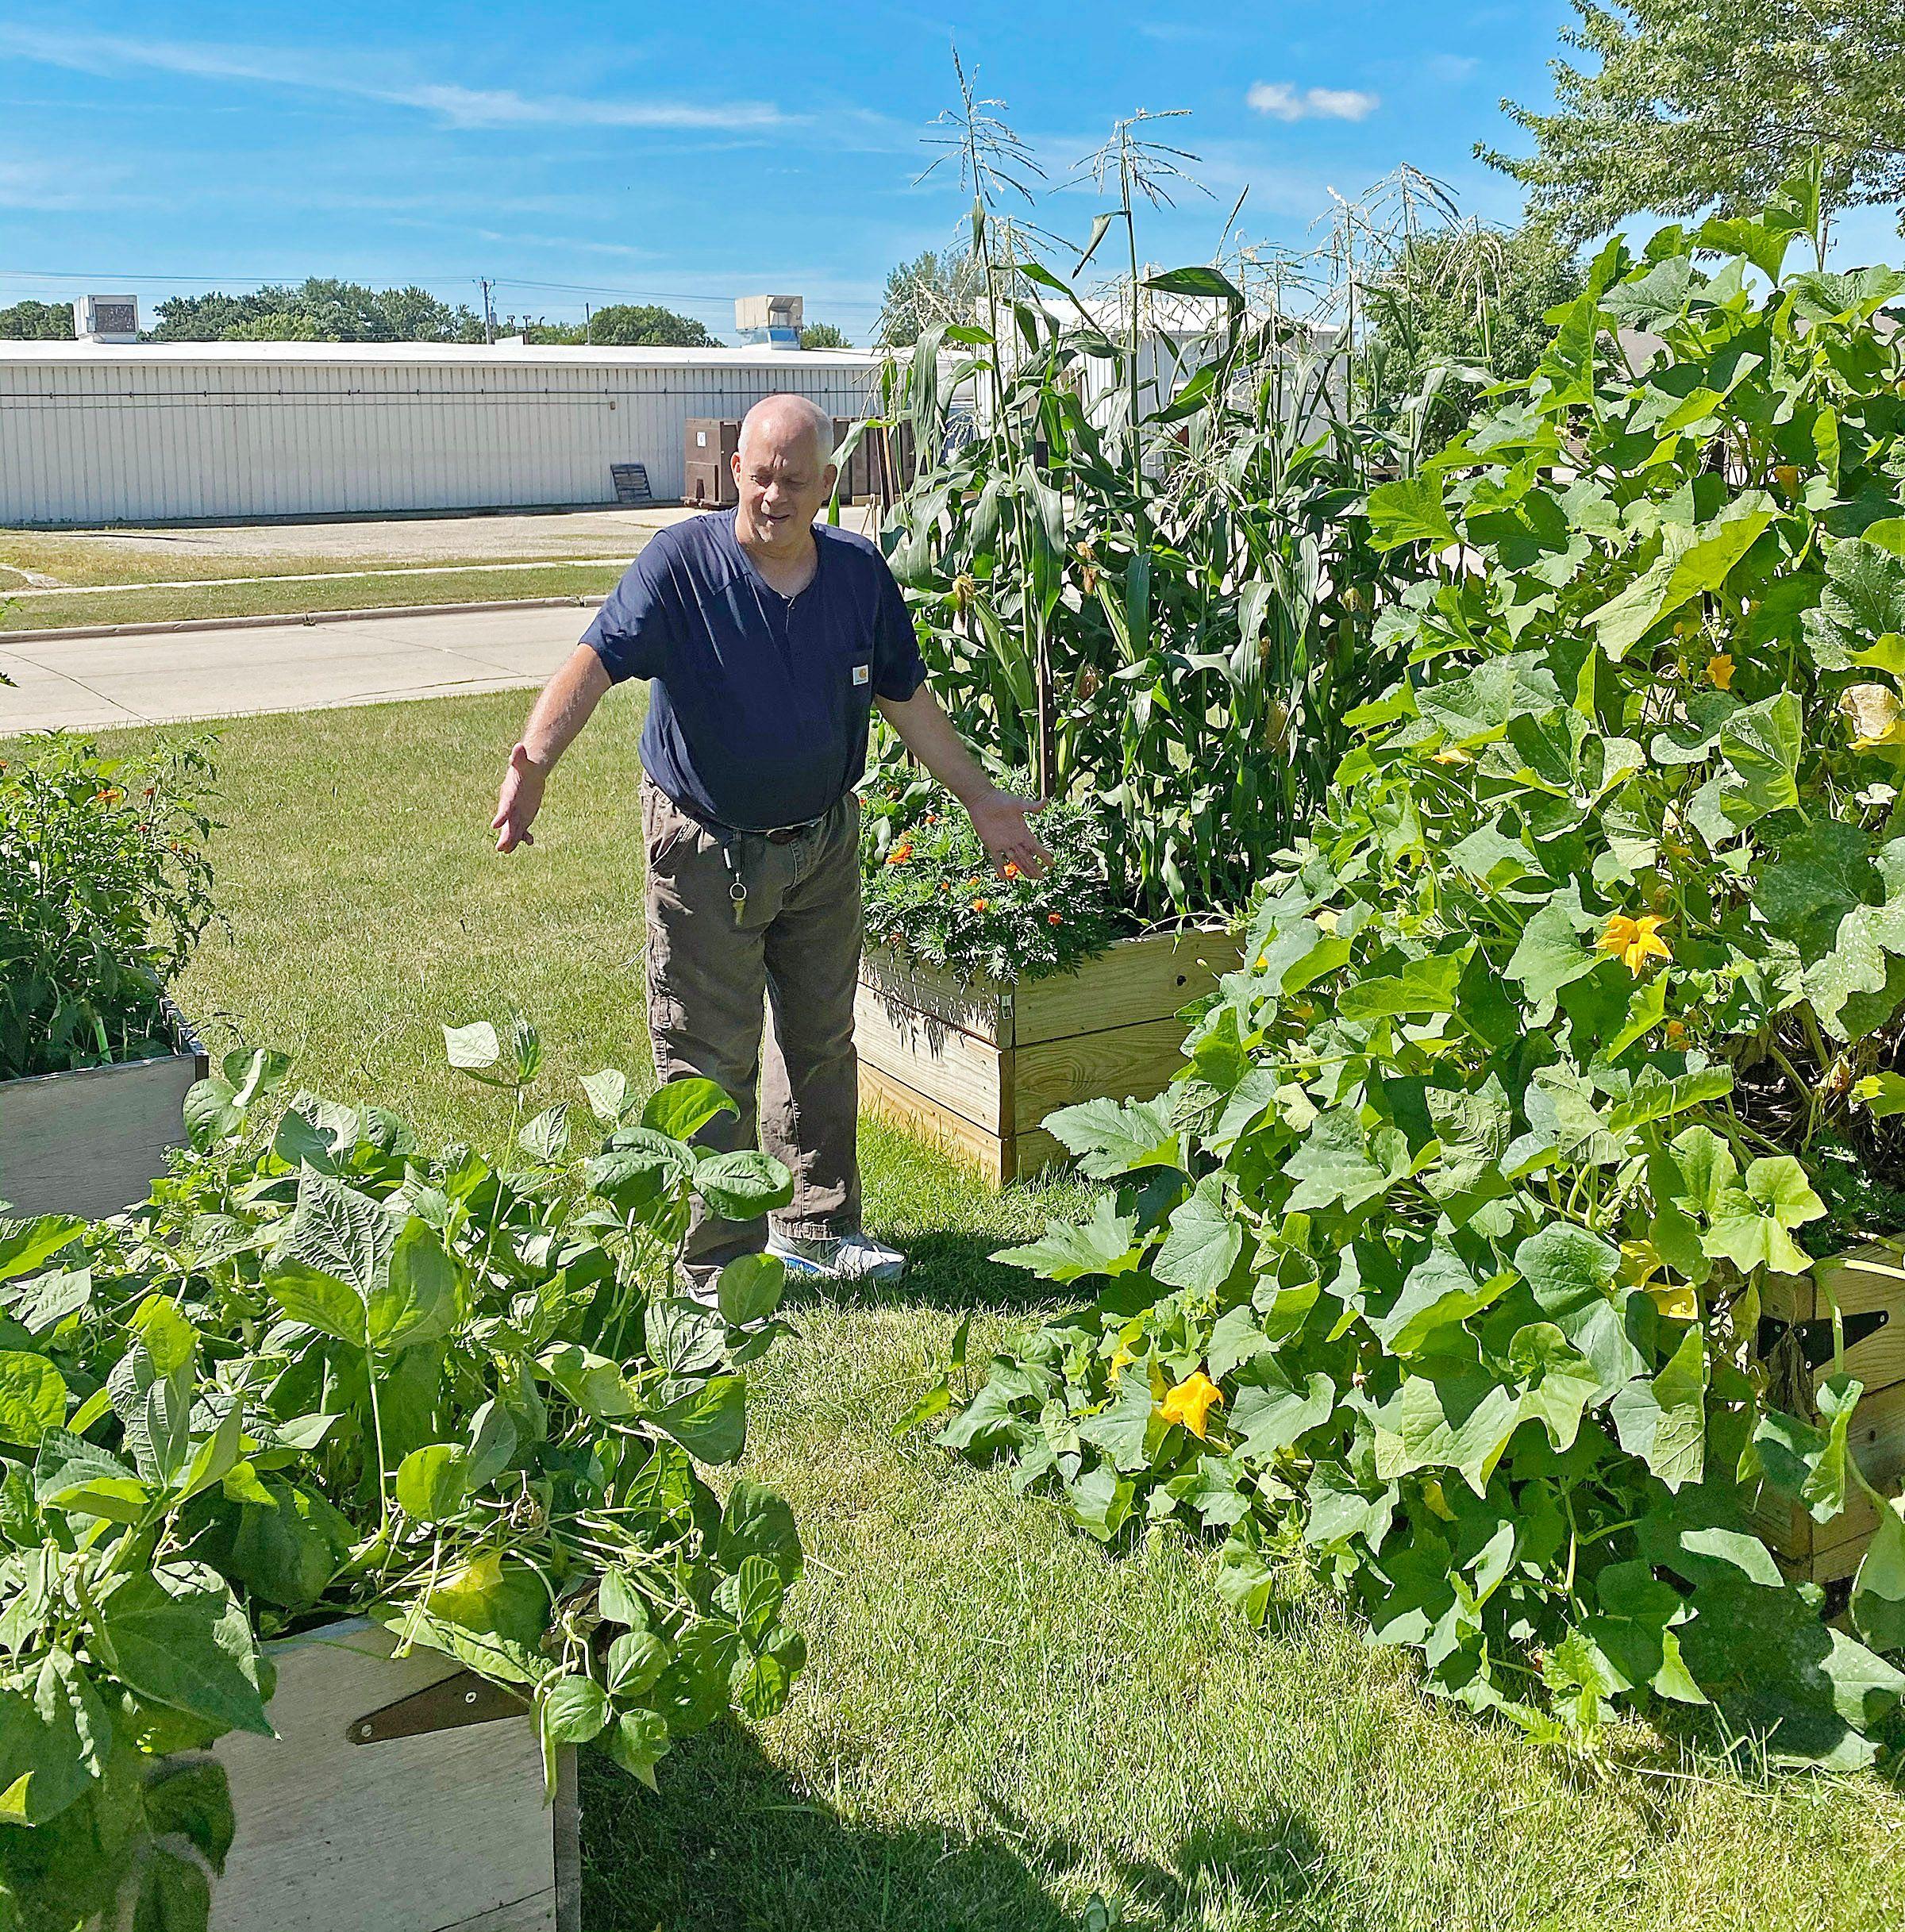 Growing Good: John's love of gardening reaps many tasty returns